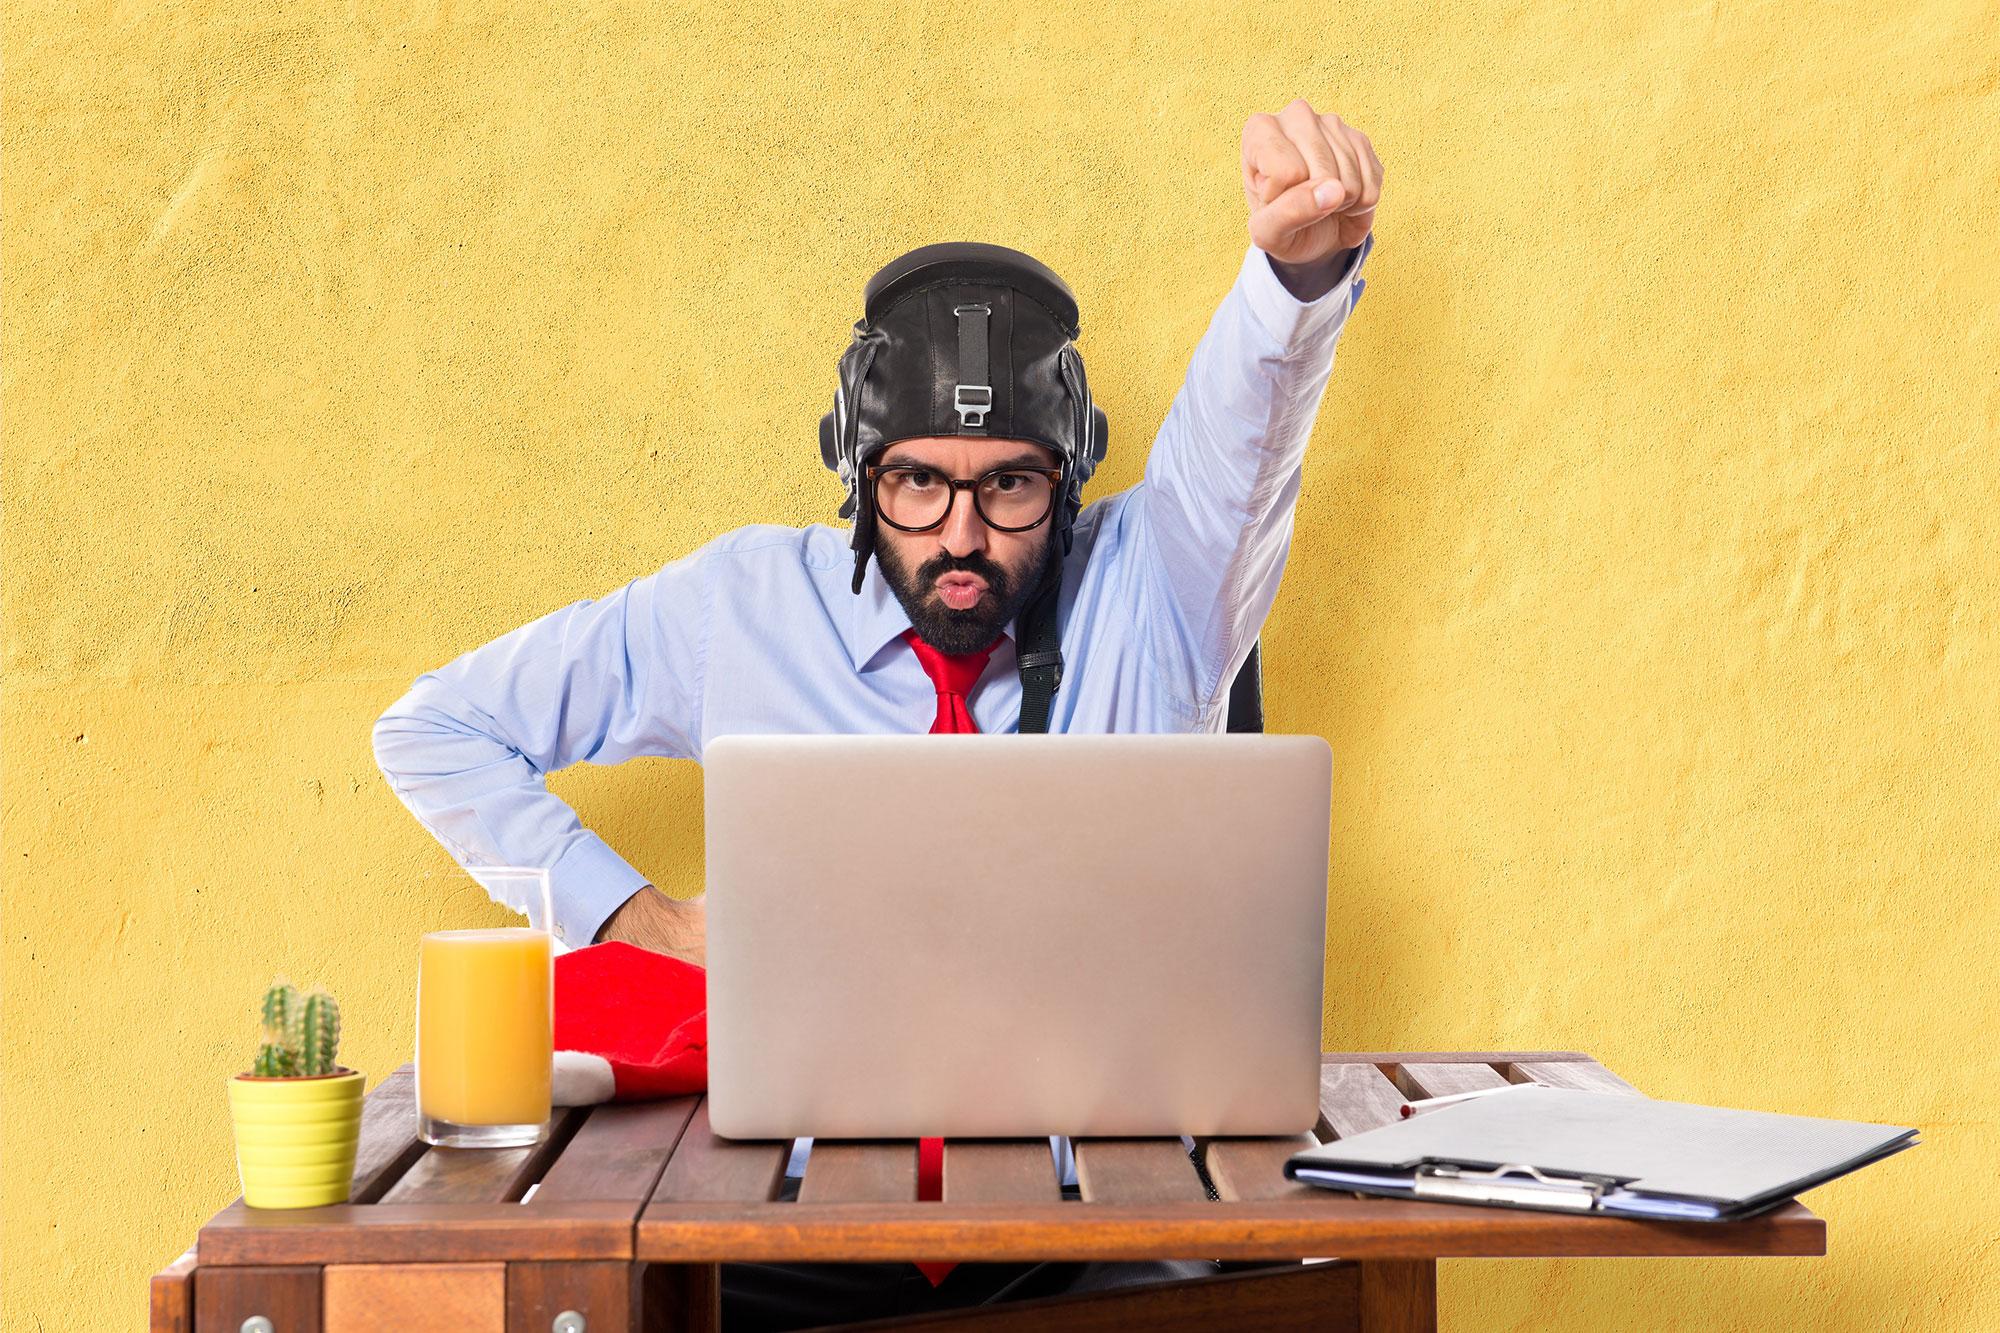 ceo startup superman 30 customer